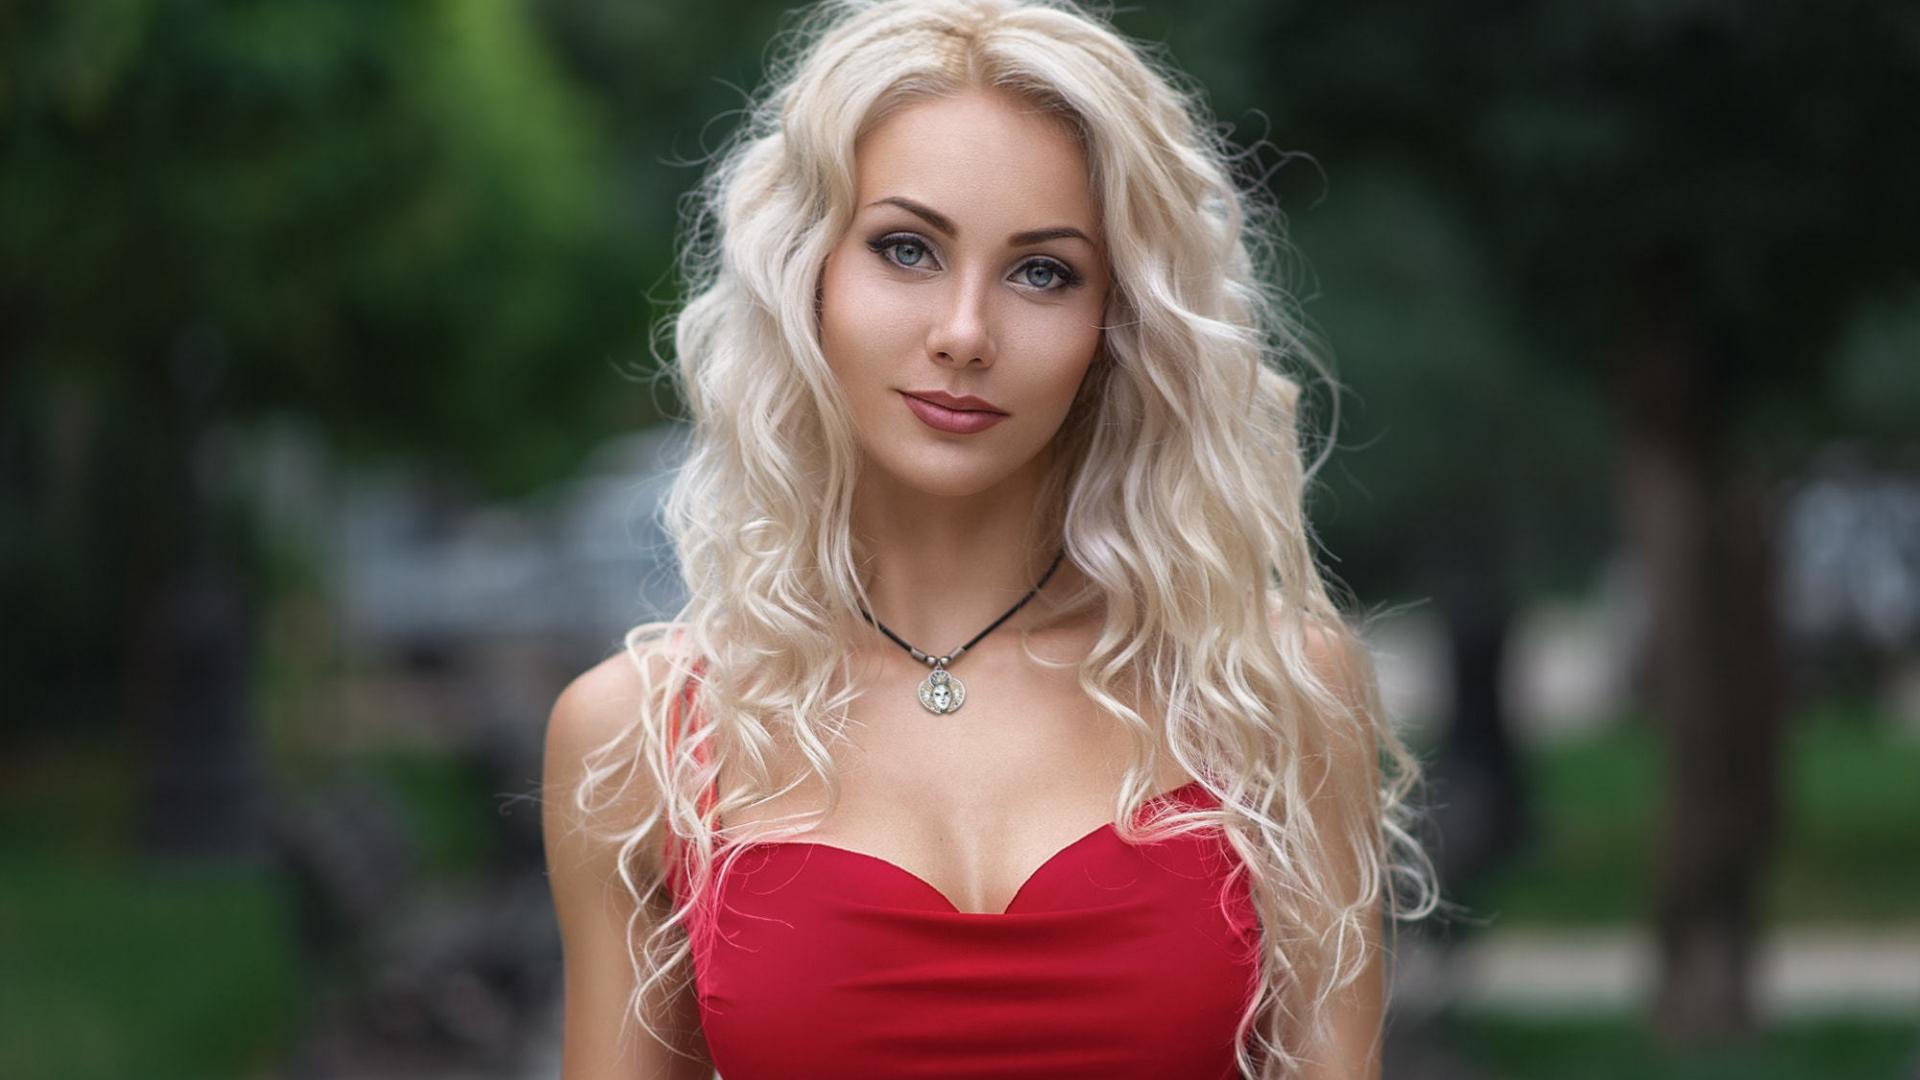 blonde-girls-dress-sexy-nude-cortana-pussy